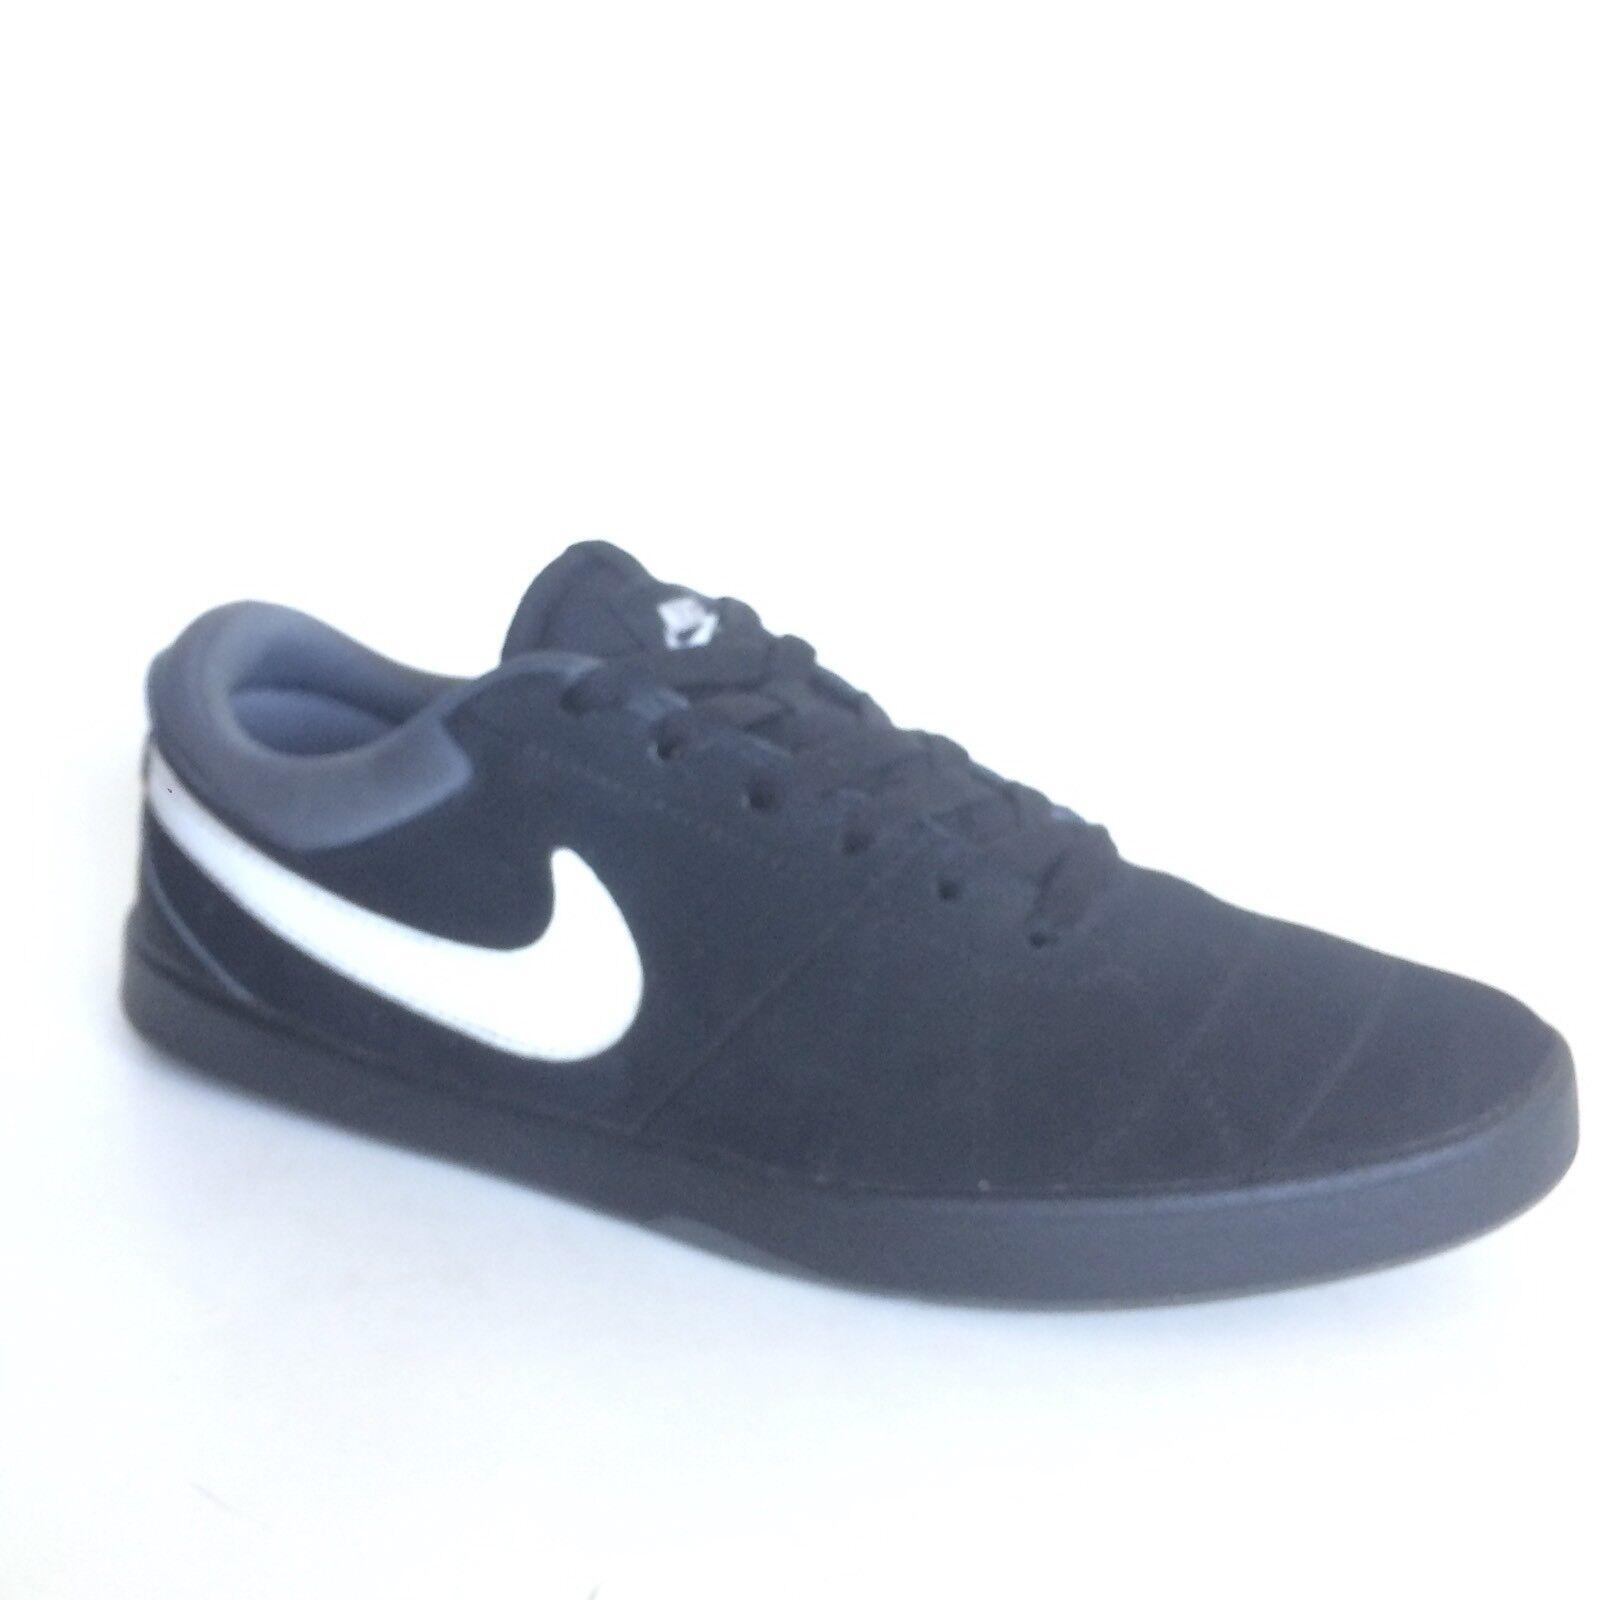 Nike SB Skateboarding Shoes Size 10 Black Leather Rabona Sneakers